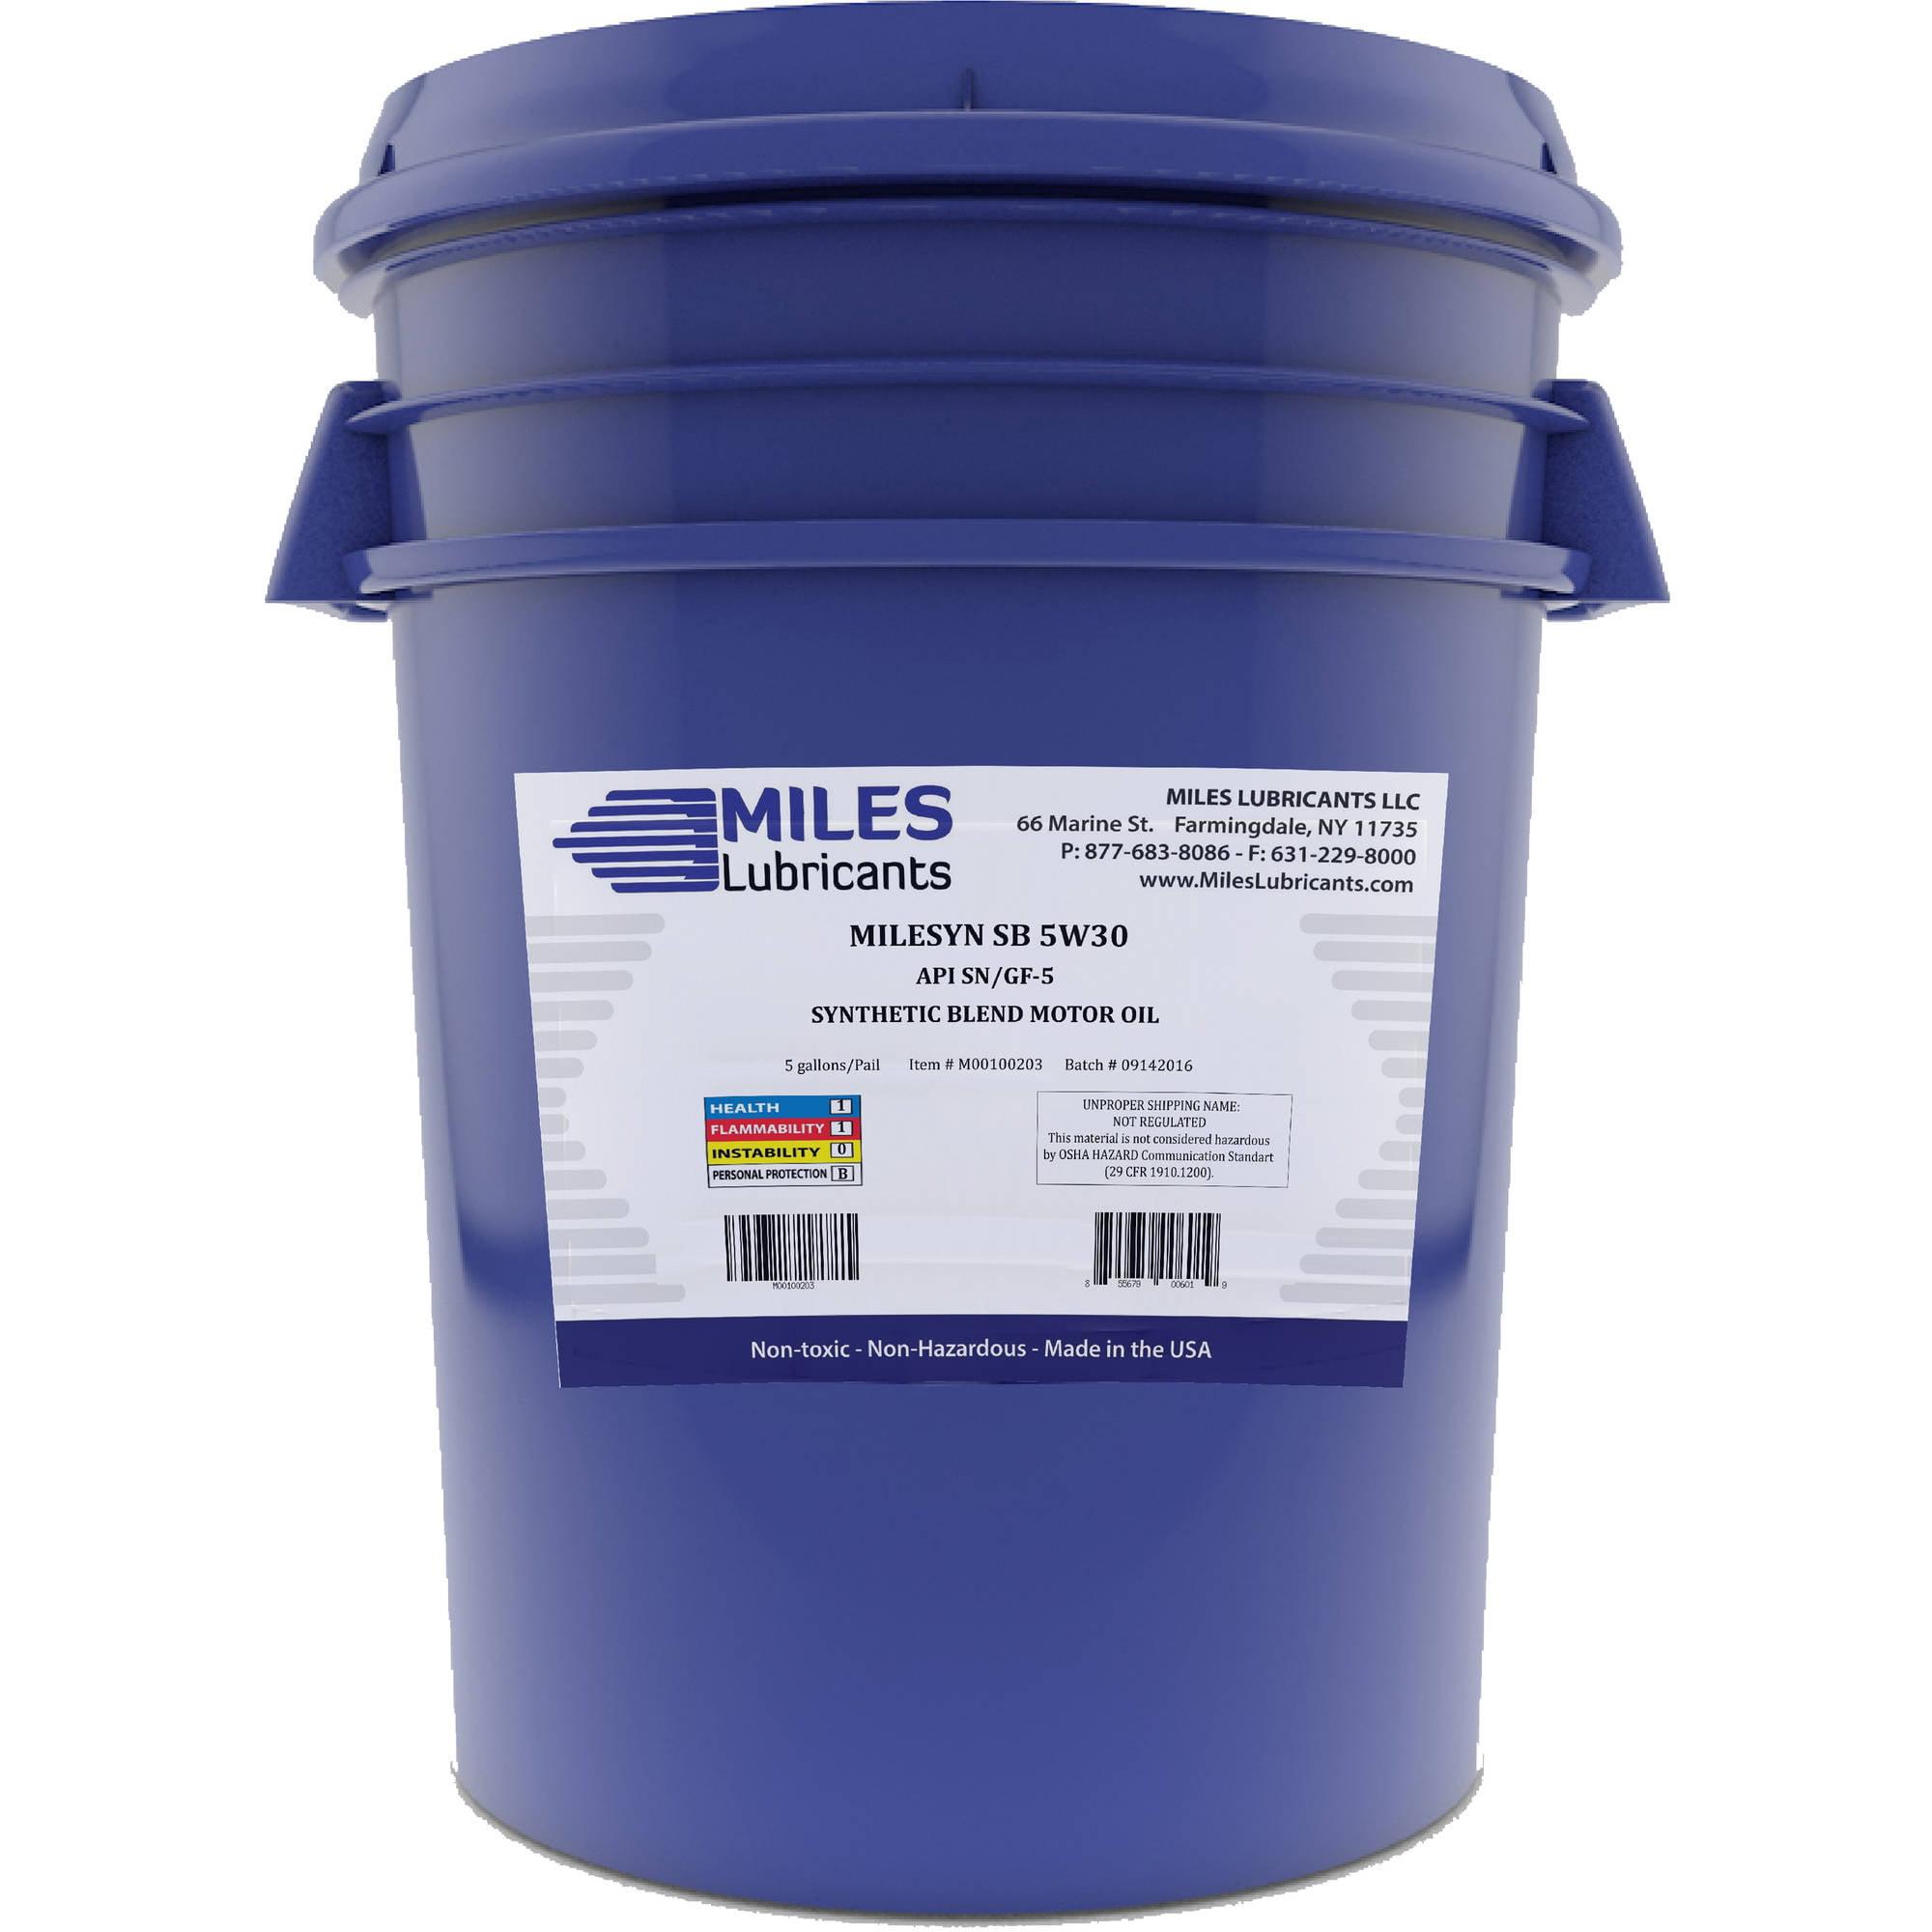 Milesyn SB 5W30 API GF-5/SN, Synthetic Blend Motor Oil, 5-Gallon Pail